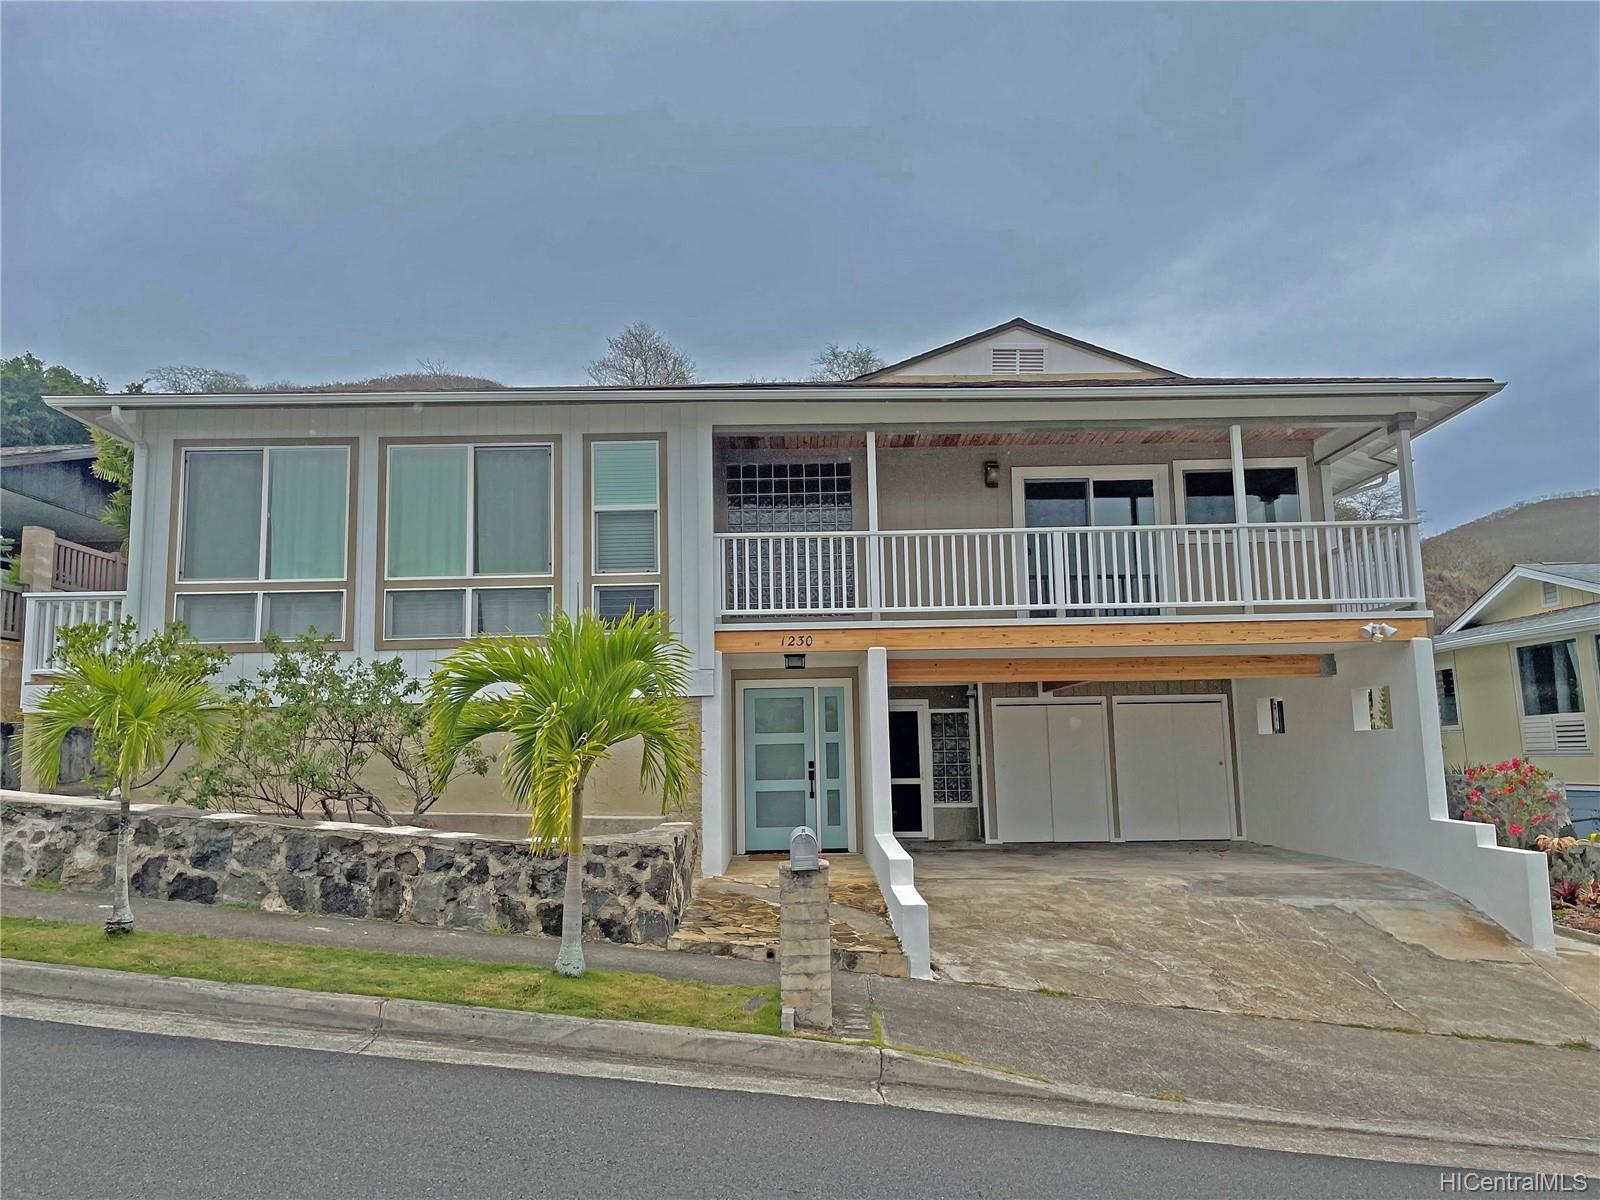 202125158 Keolu Hills, Kailua ,Hi 96734, - rental